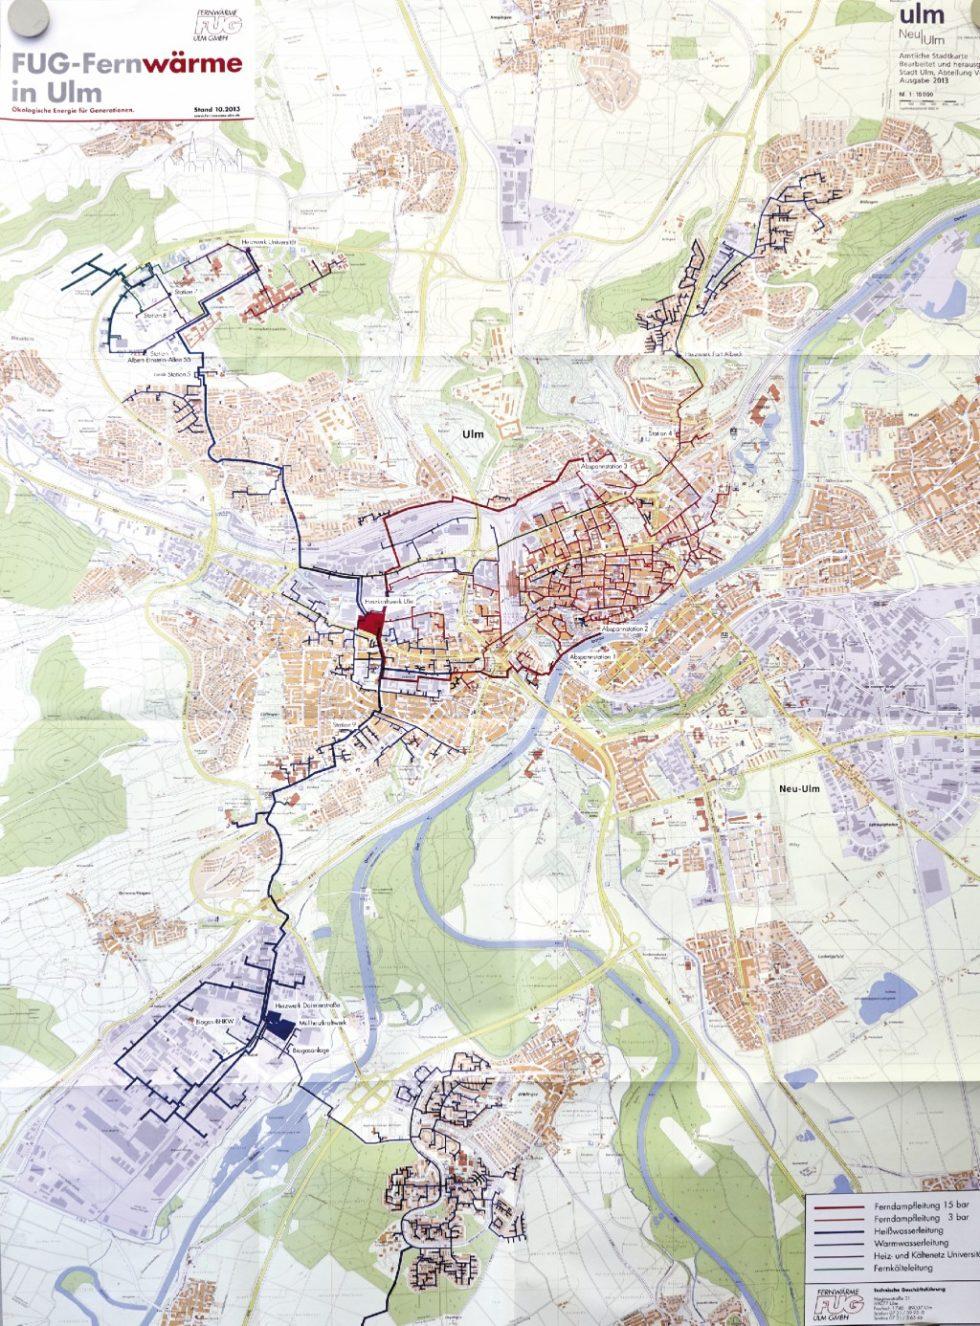 Das Fernwärmenetz der Stadt Ulm, stets im Blick im Büro der FUG. Bild: FUG Fernwärme